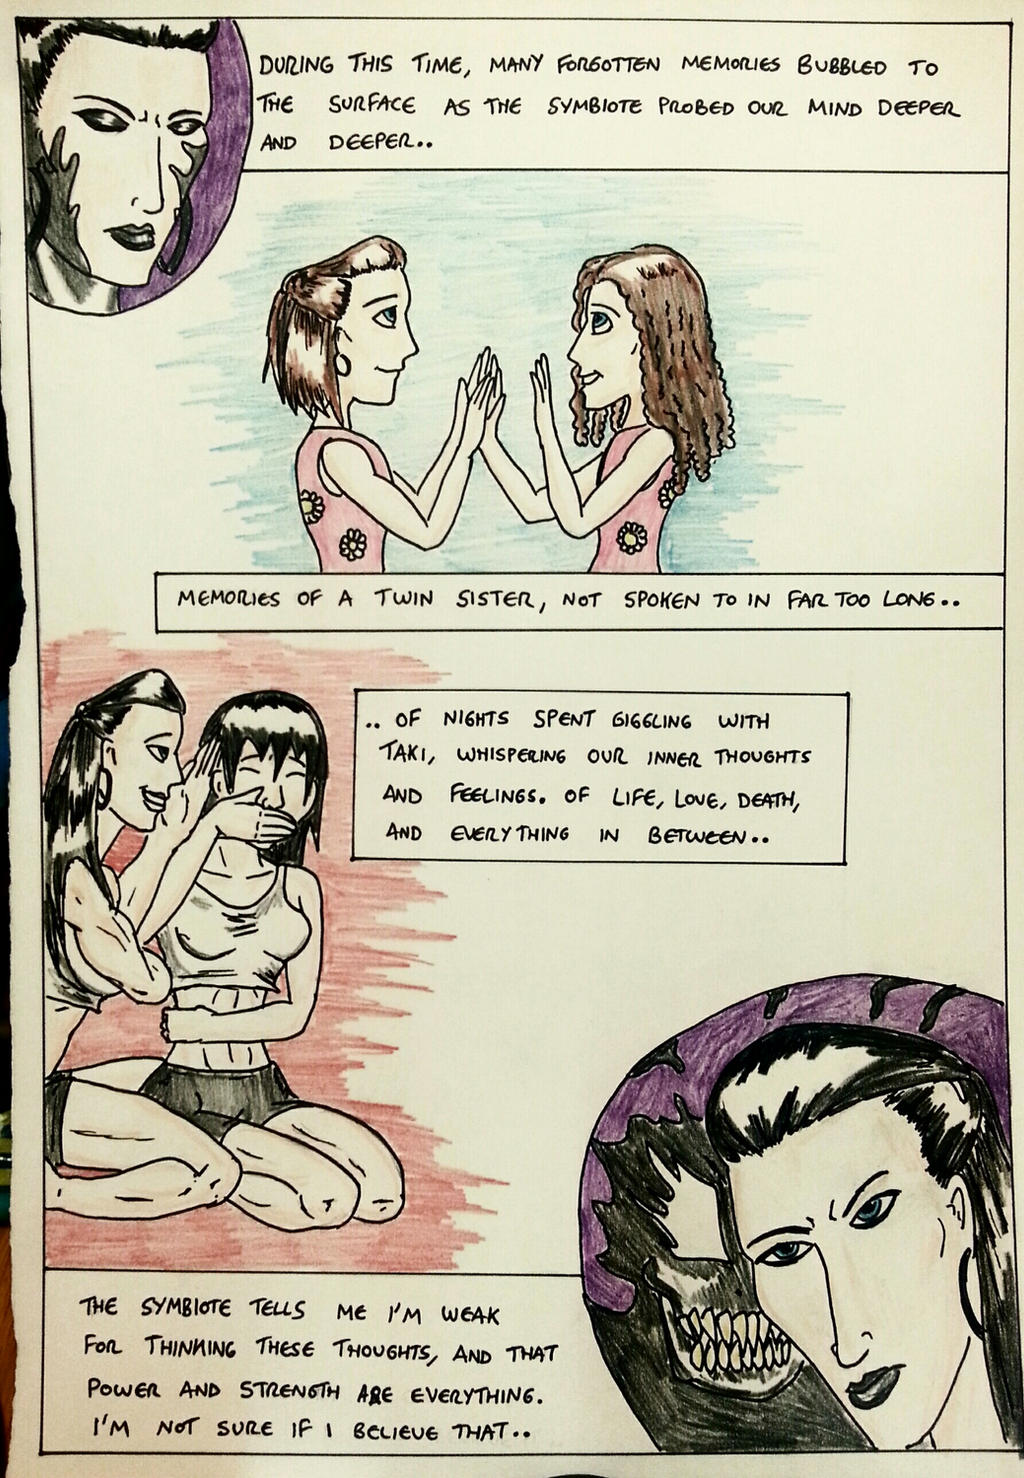 Kate Five vs Symbiote comic Page 25